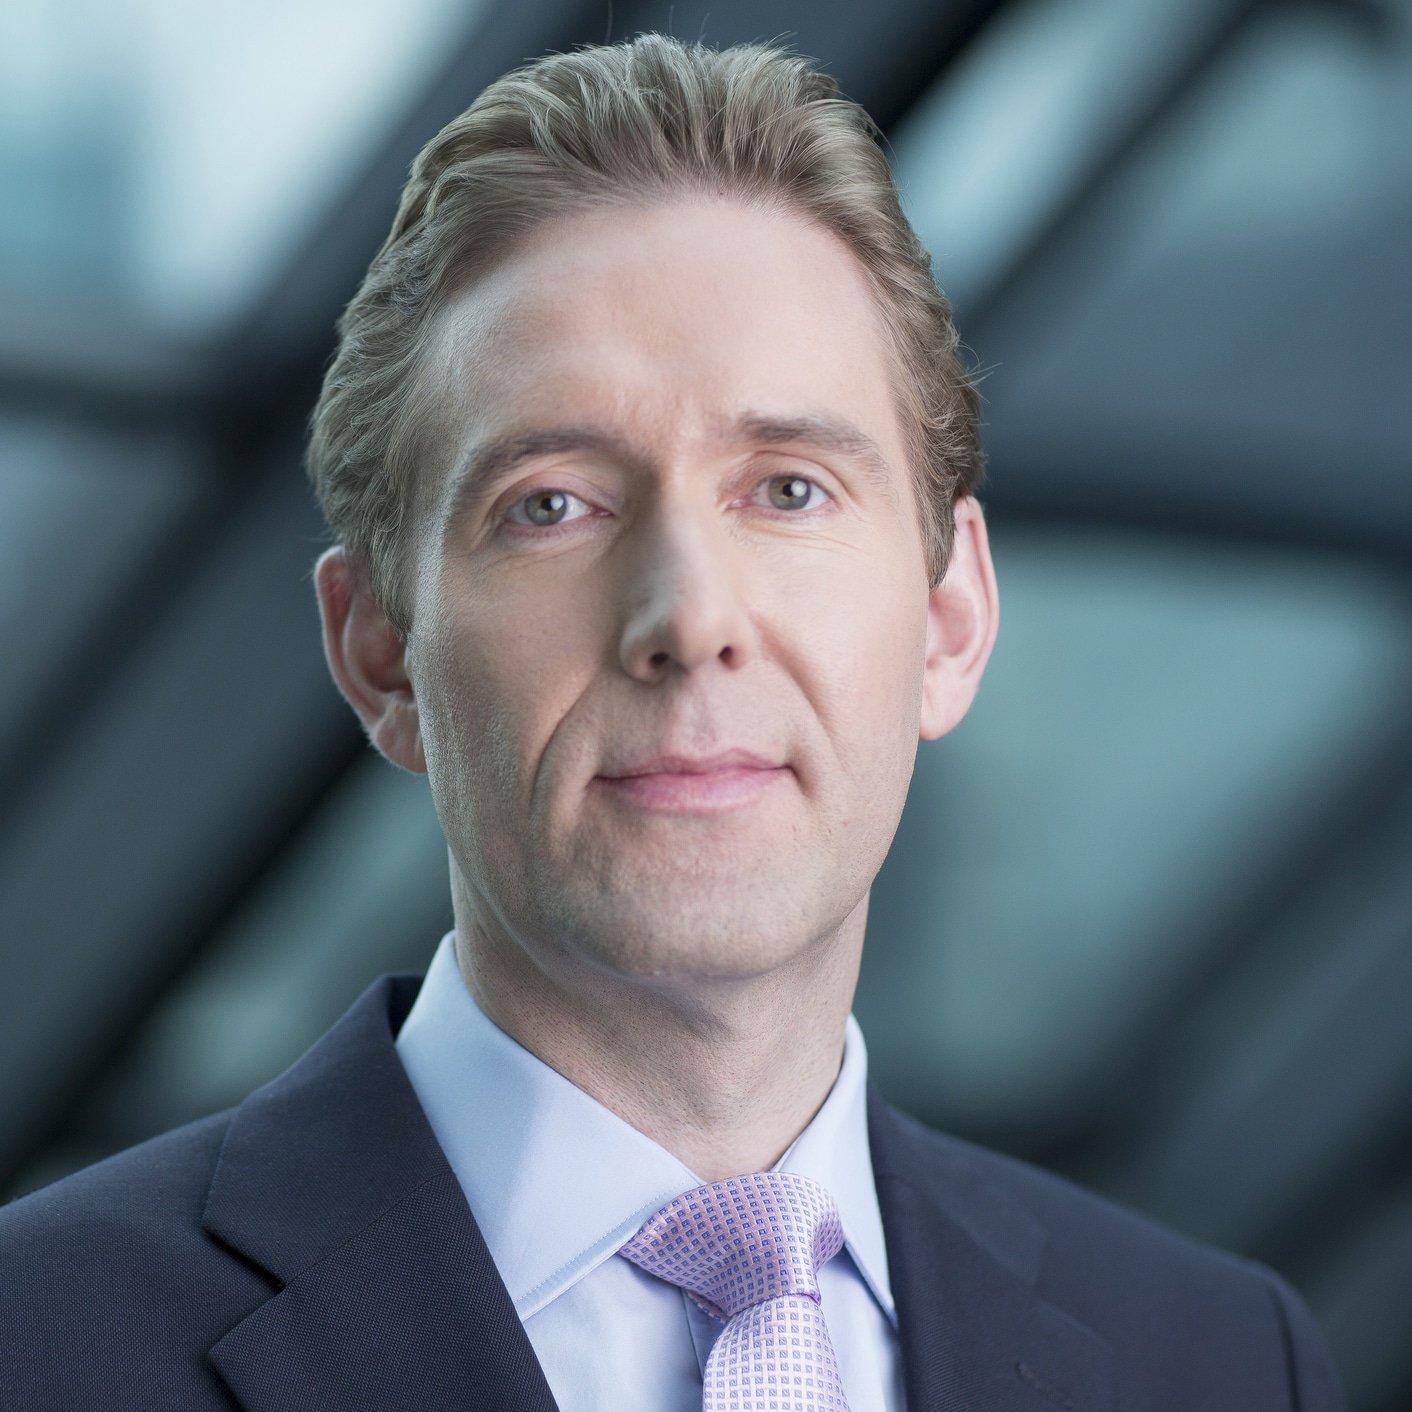 Mark-Barton-News-Journalist-Broadcaster-presenter-anchor-at-Great-British-Speakers